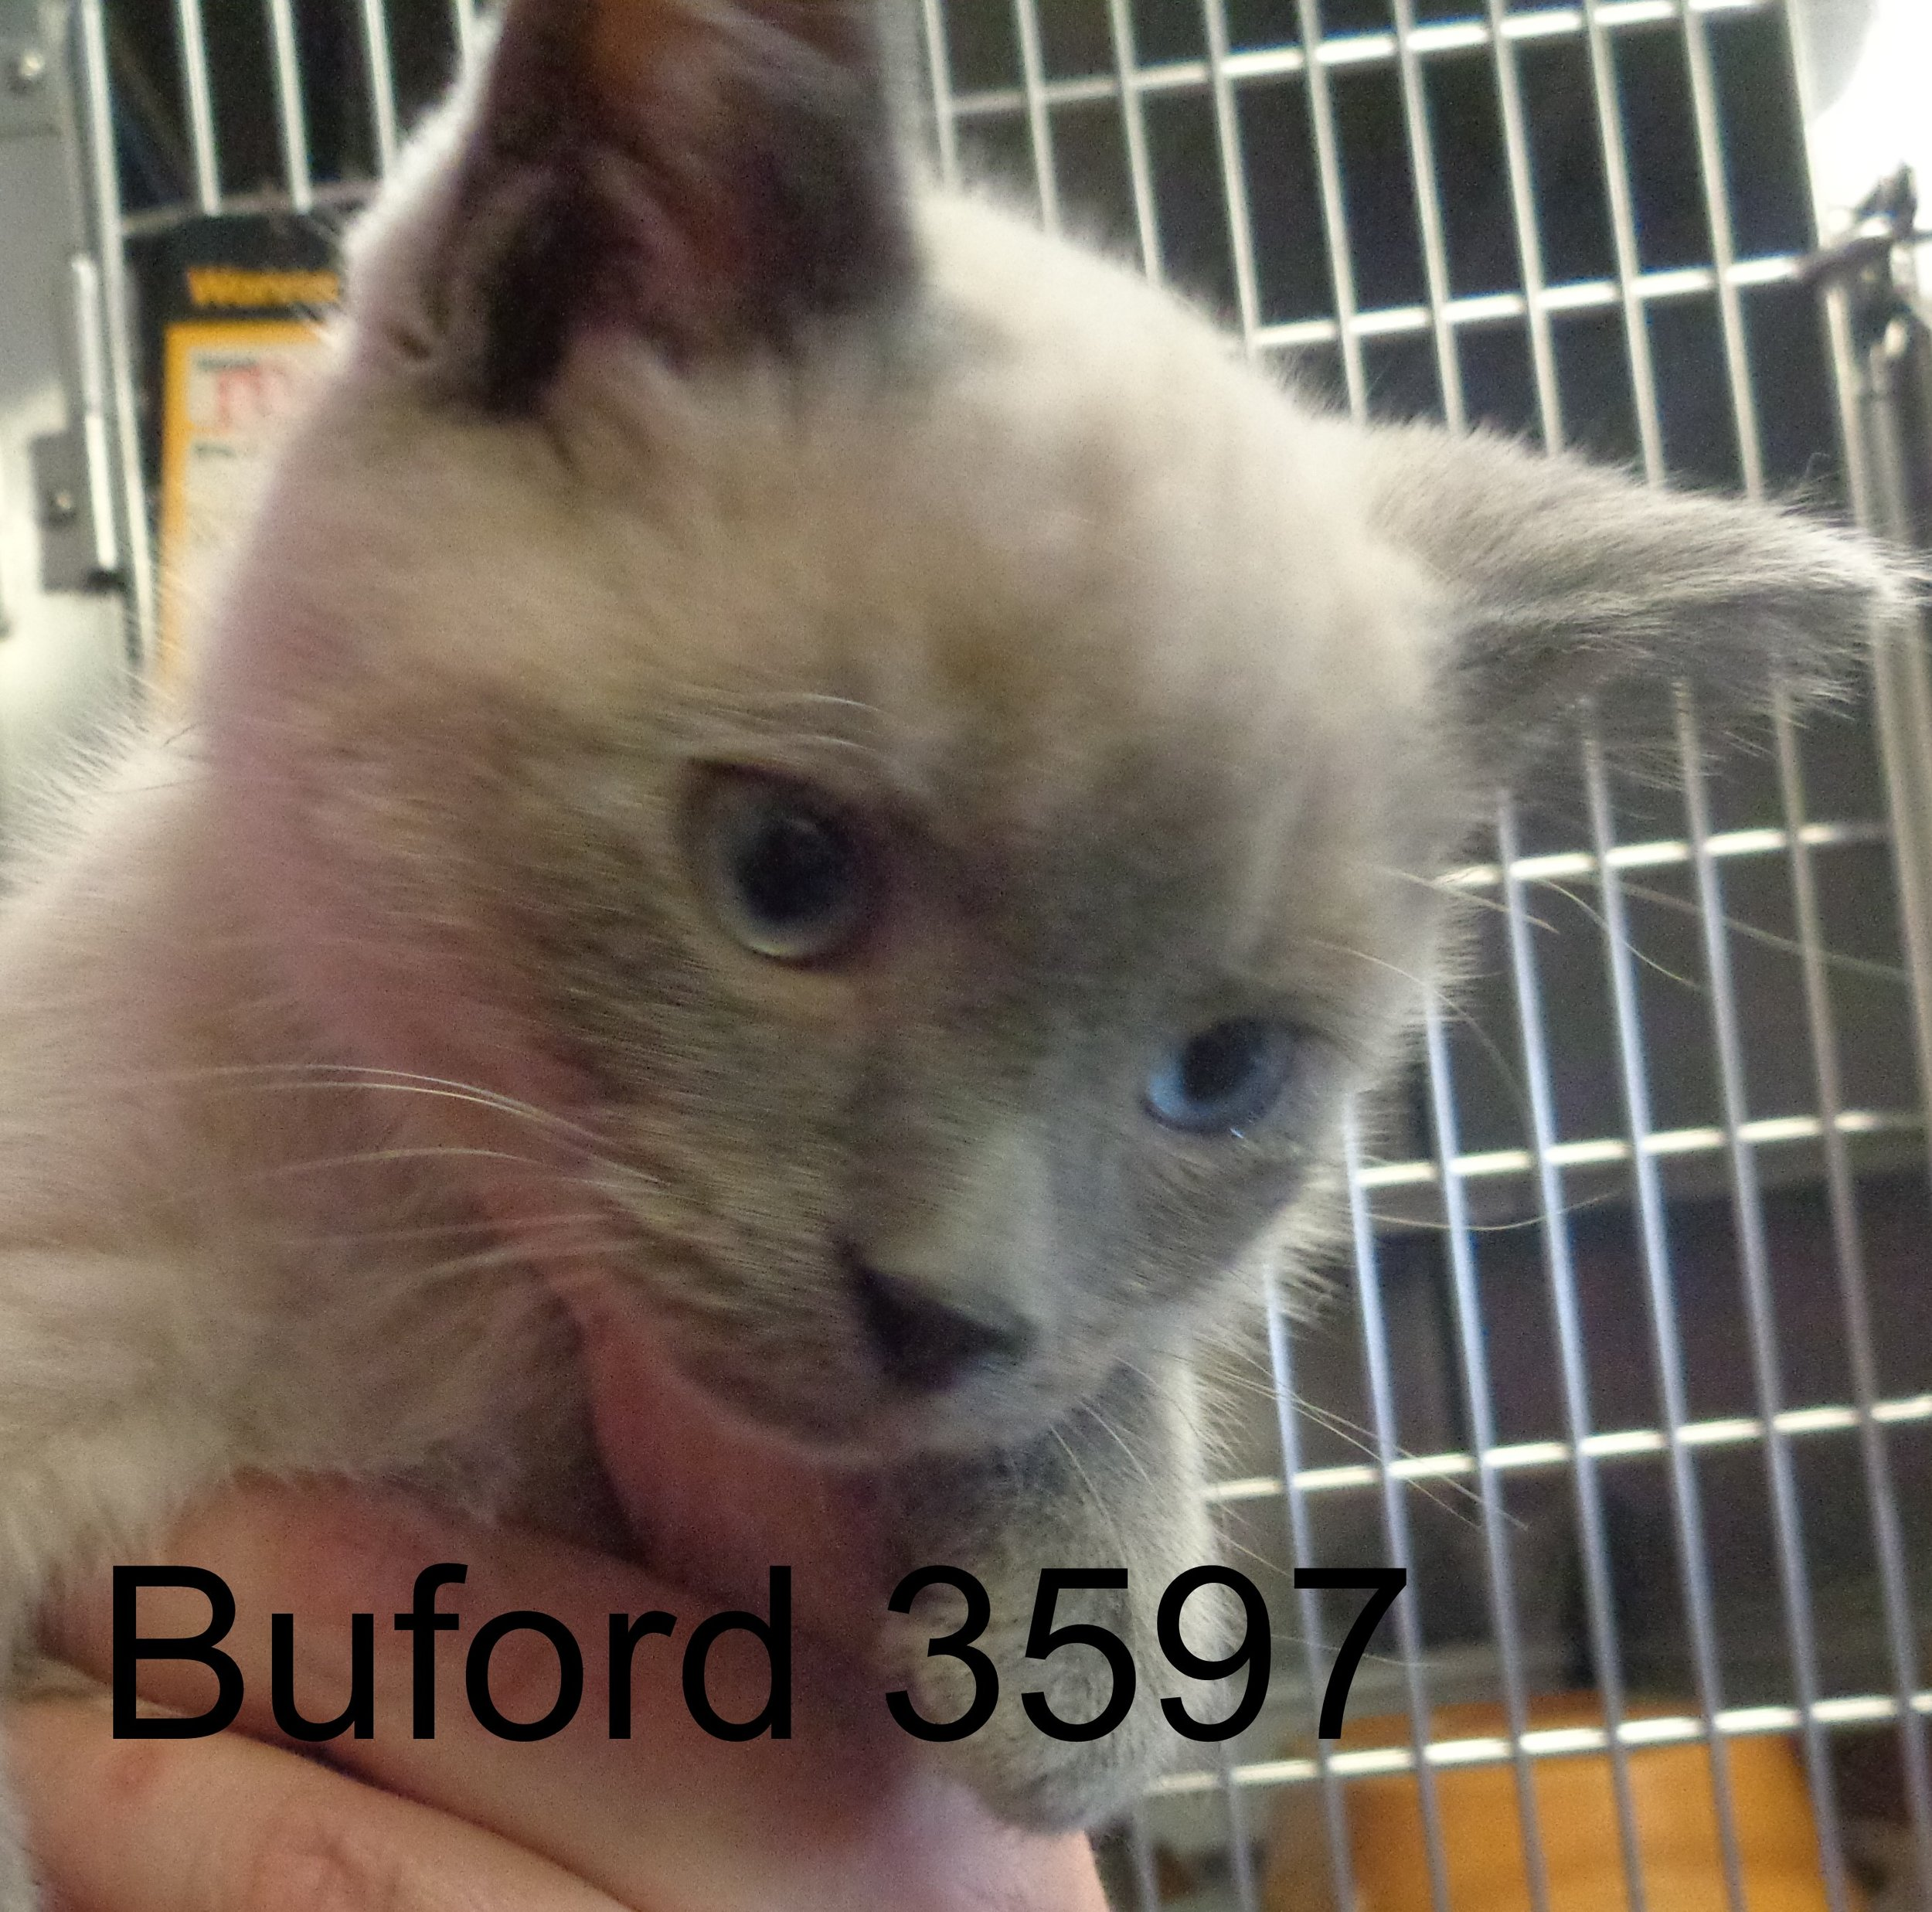 Buford 3597 .JPG